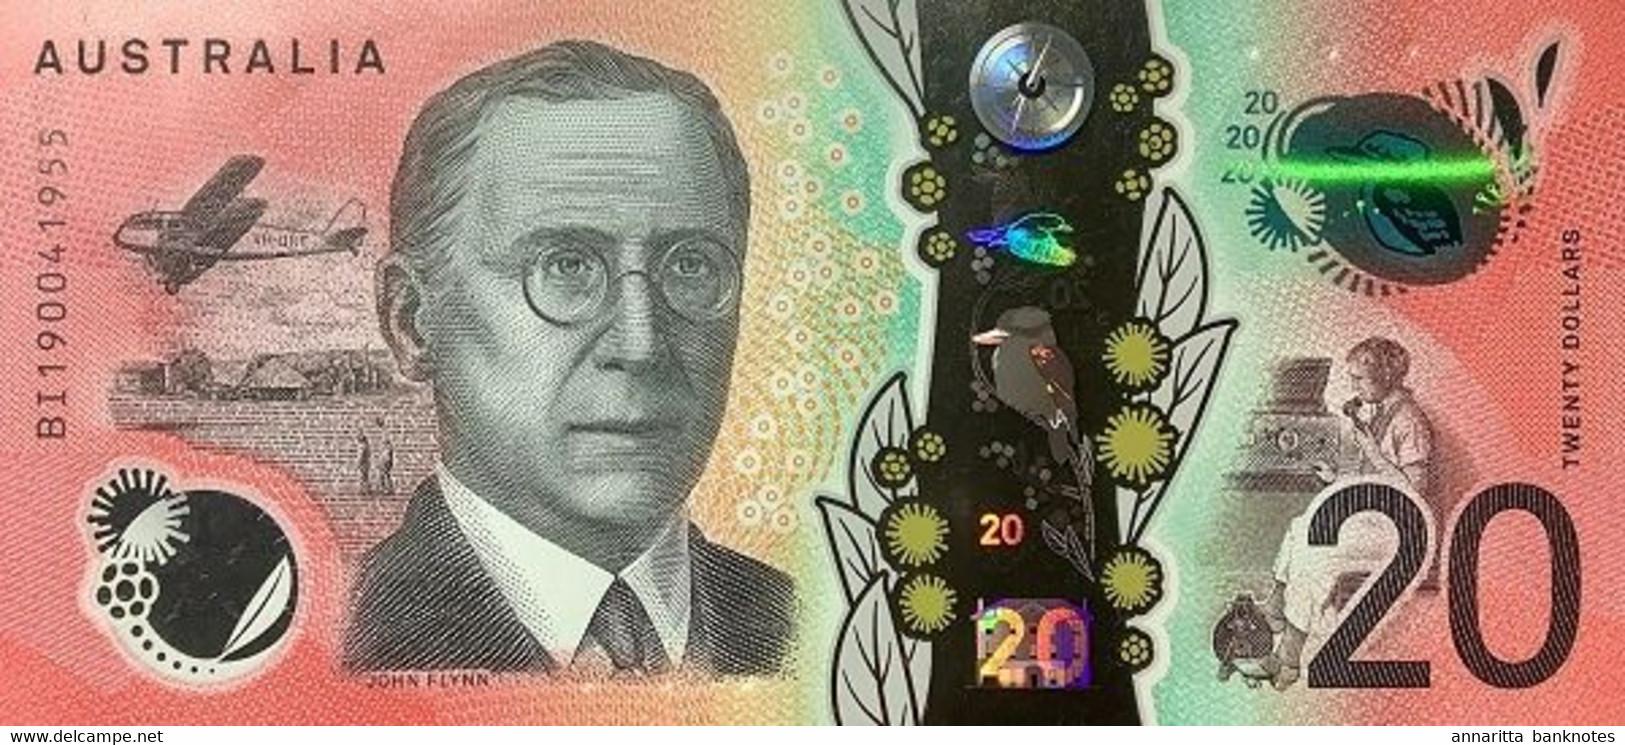 * AUSTRALIA 100 DOLLARS ND (1992) P-48d UNC SIG. COLE & FRASER [AU216d] - Decimal Government Issues 1966-...